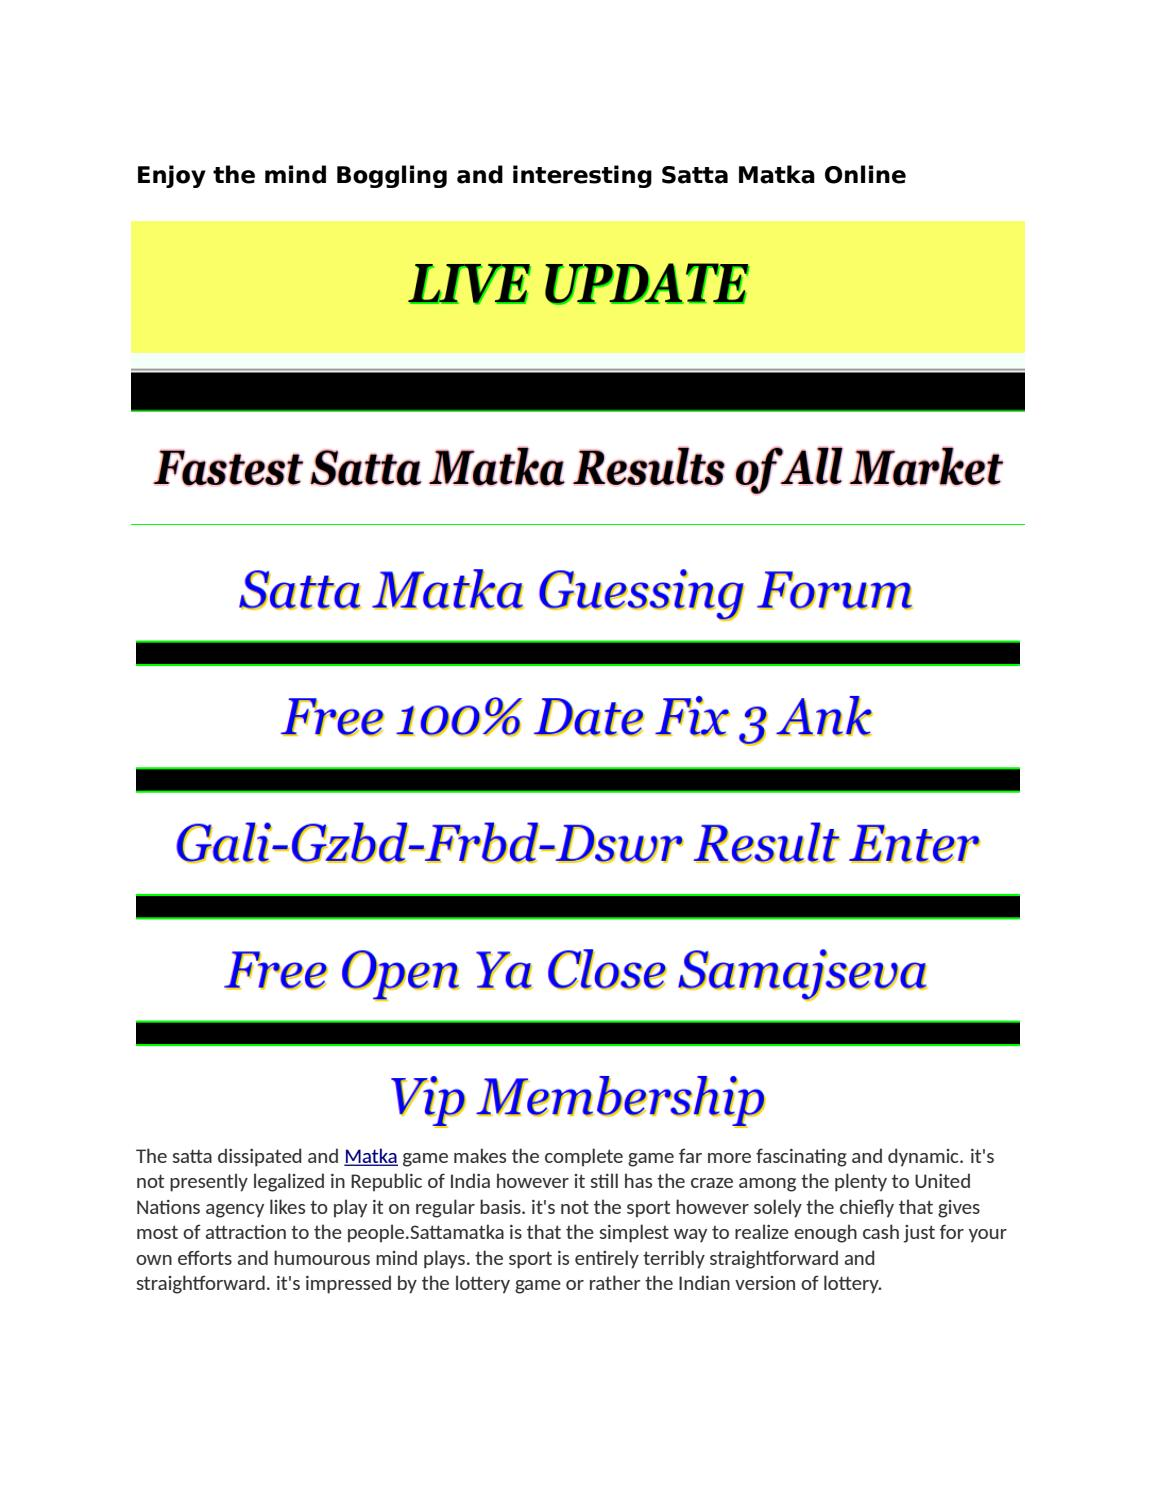 Enjoy the mind Boggling and interesting Satta Matka online